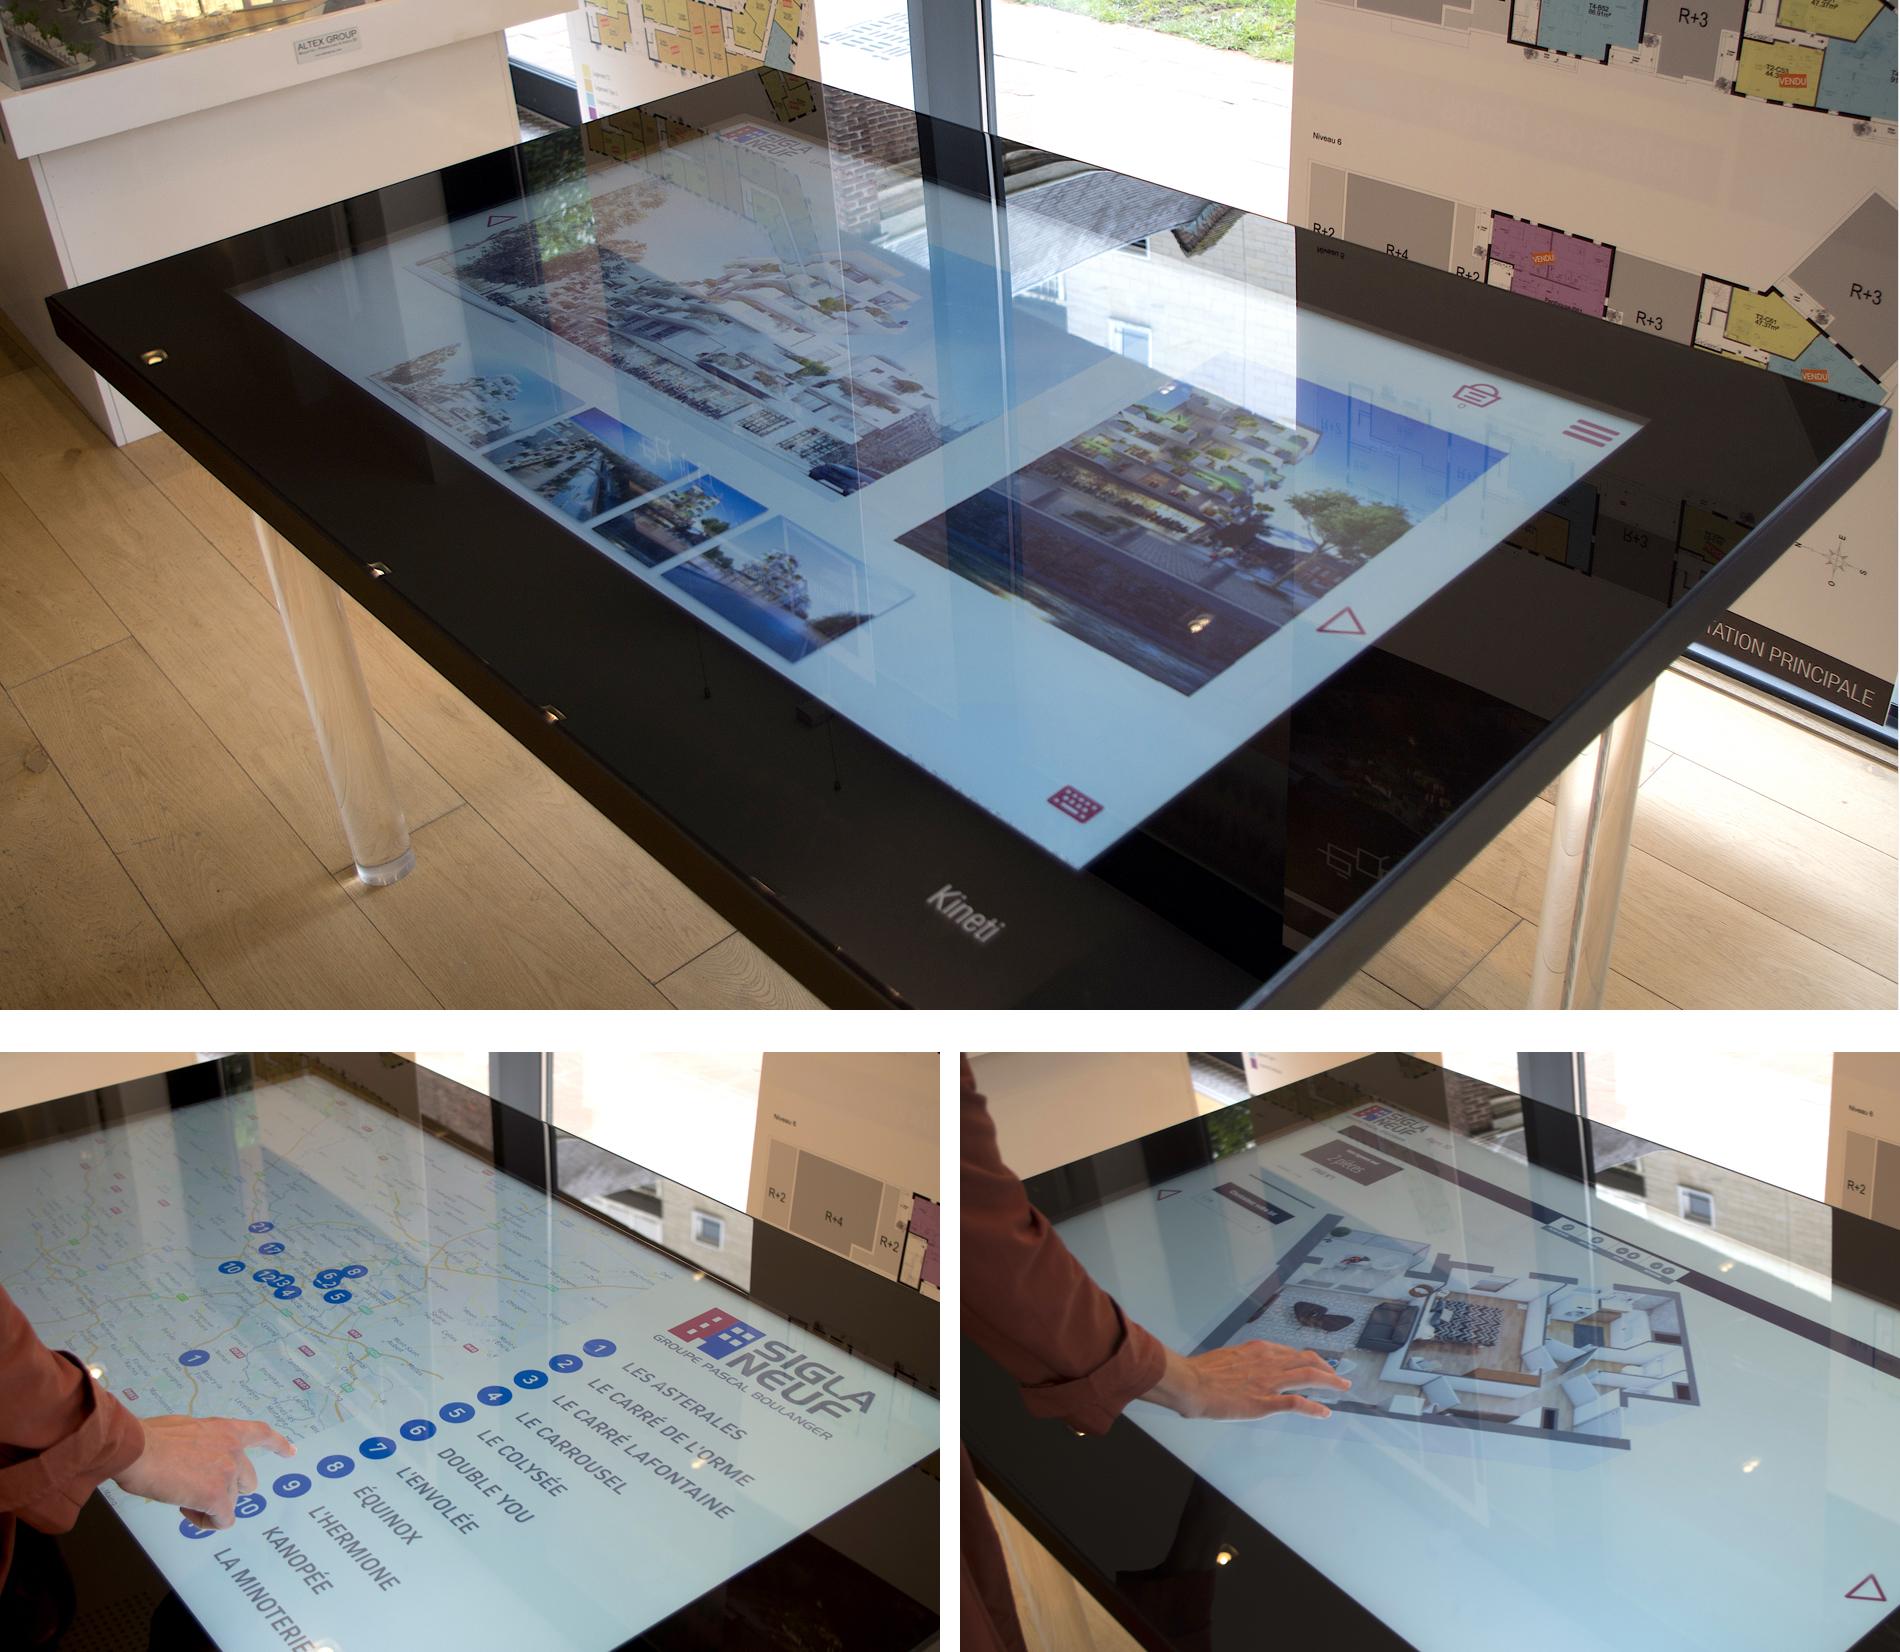 Blog Actu Showroom Table Tactile 02 2x Siglaneuf